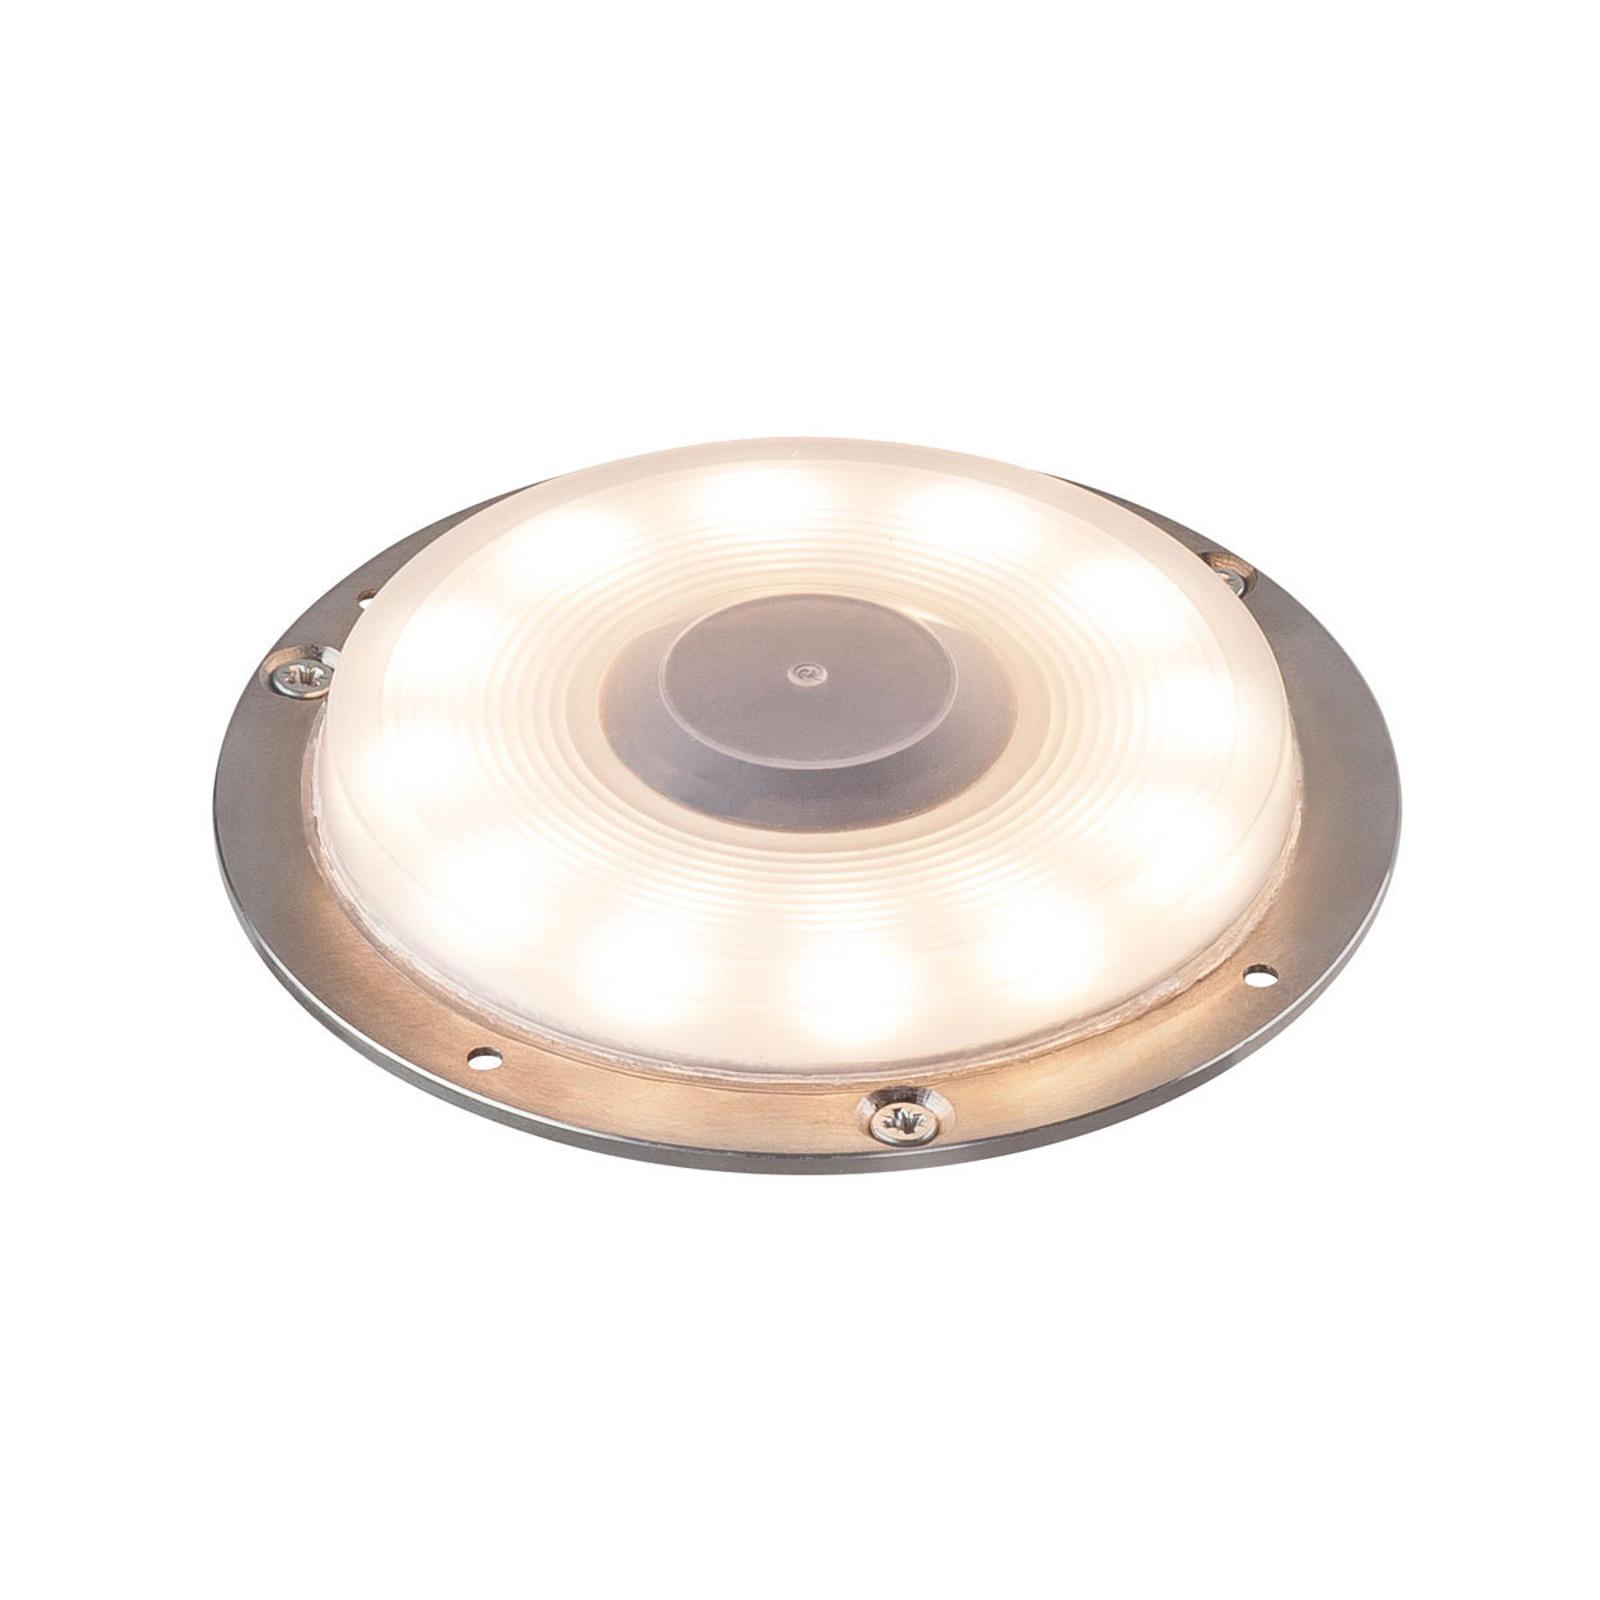 SLV Big Plot LED-bakkespot, aluminium